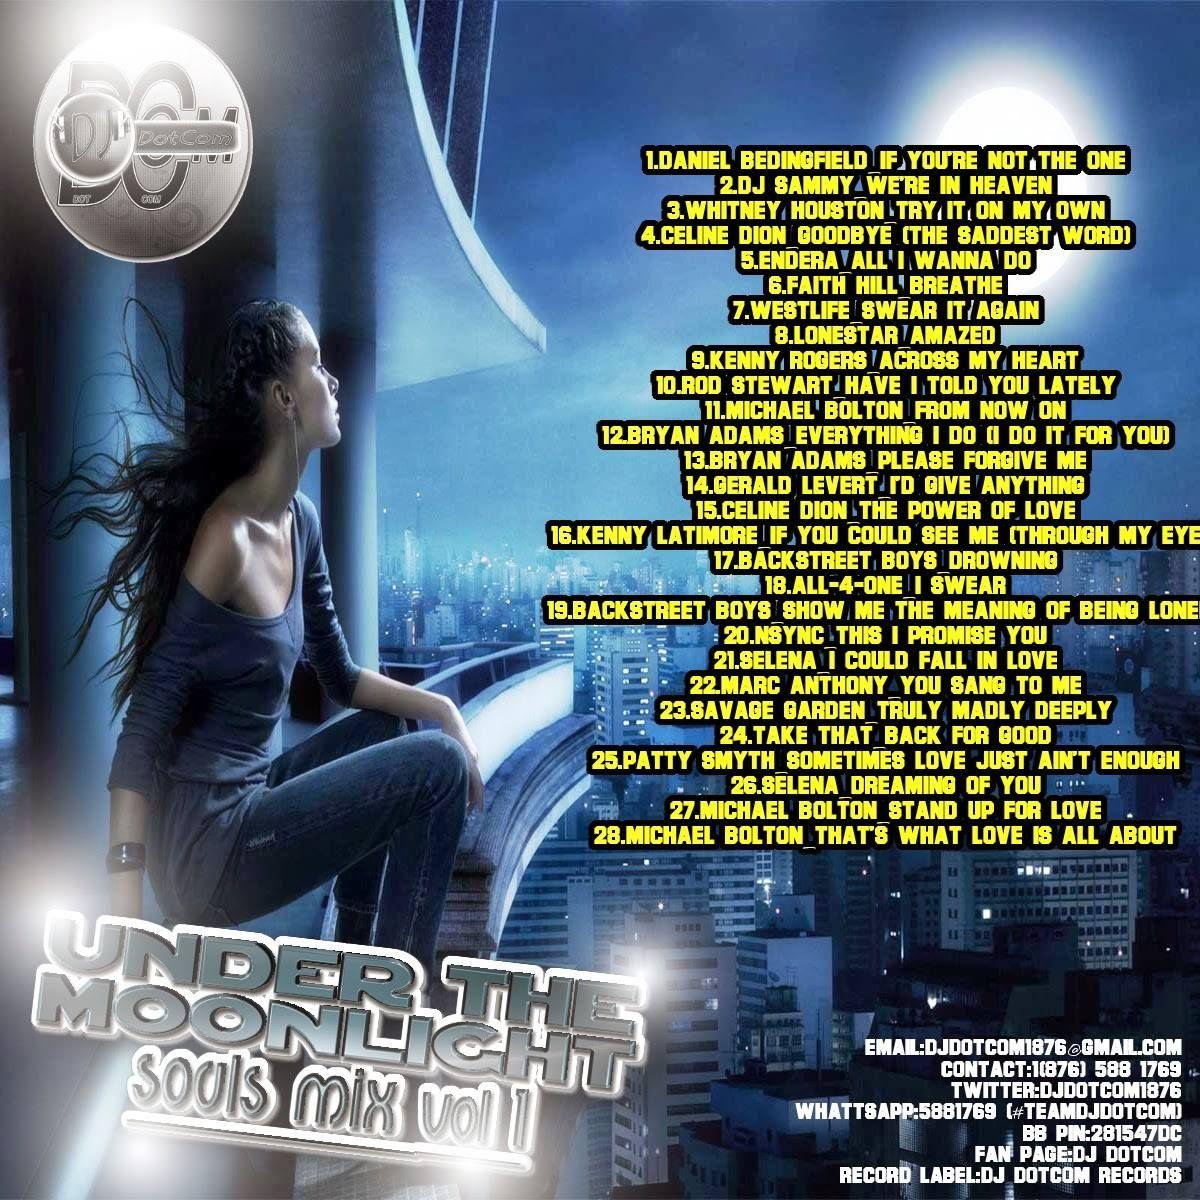 ... adams... - Download   Added by DJ DOTCOM (MIXTAPE GENIUS)   Audiomack